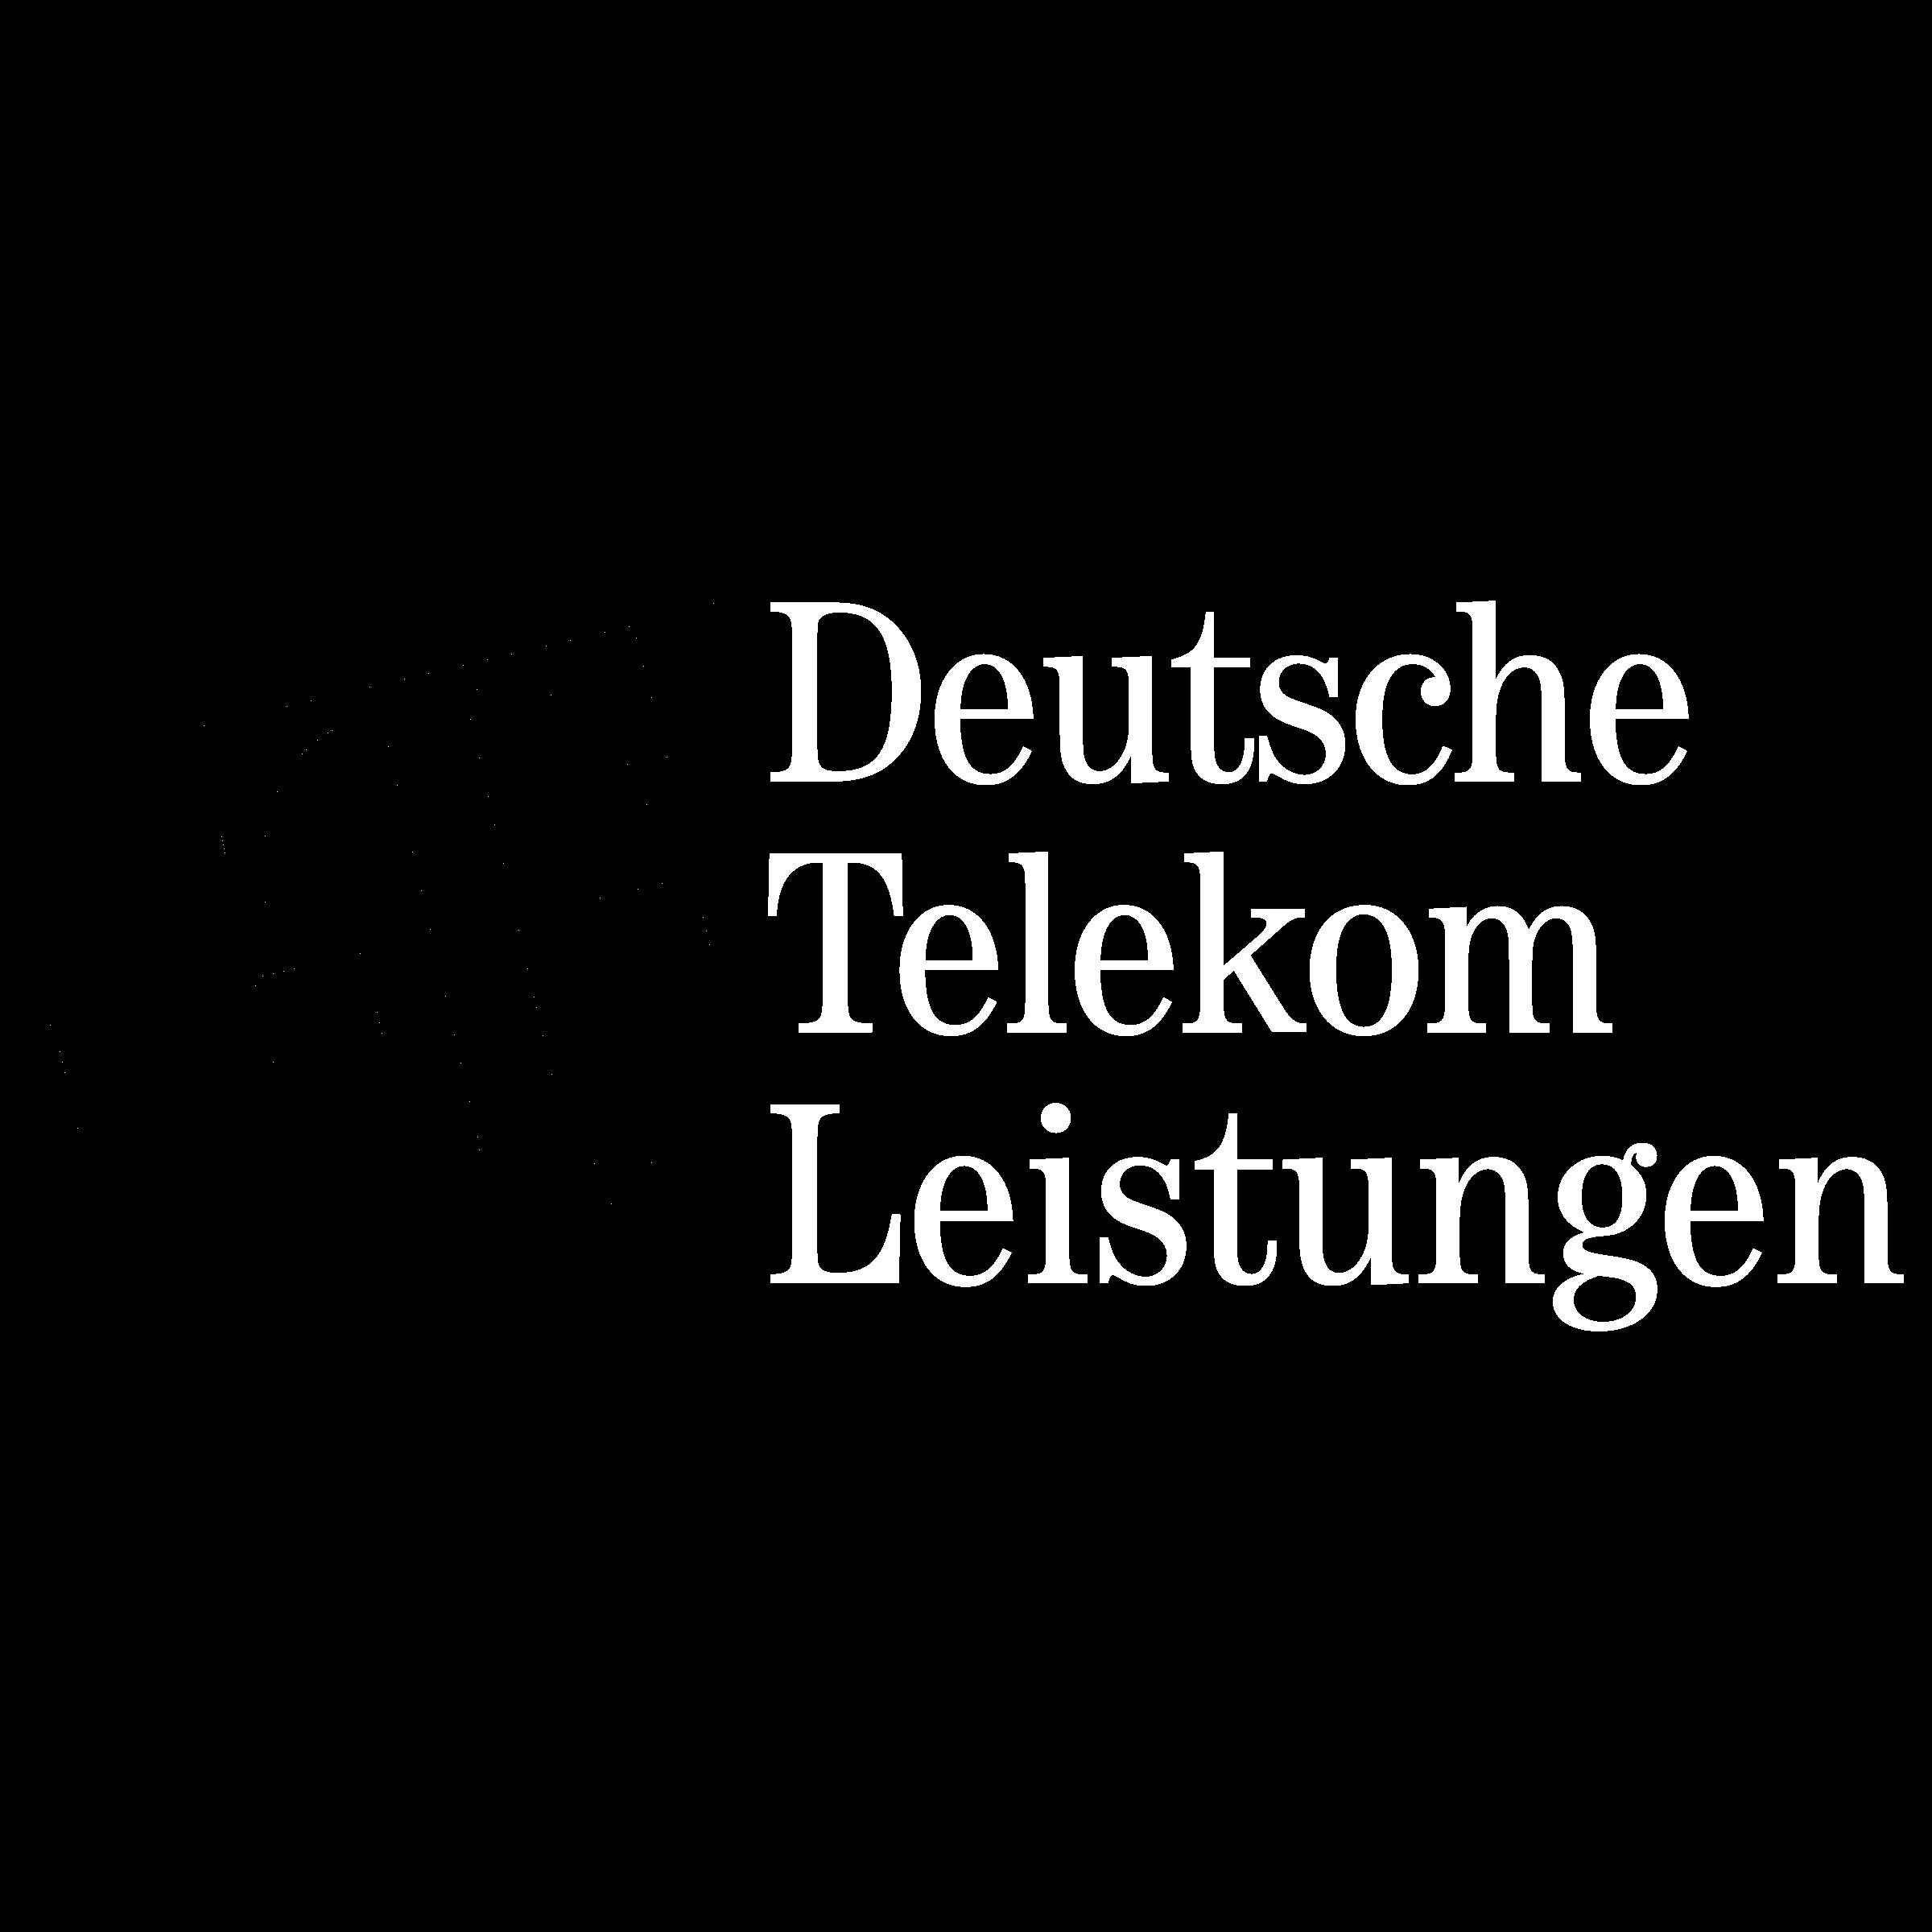 Deutsche Telekom Logo PNG Transparent & SVG Vector.